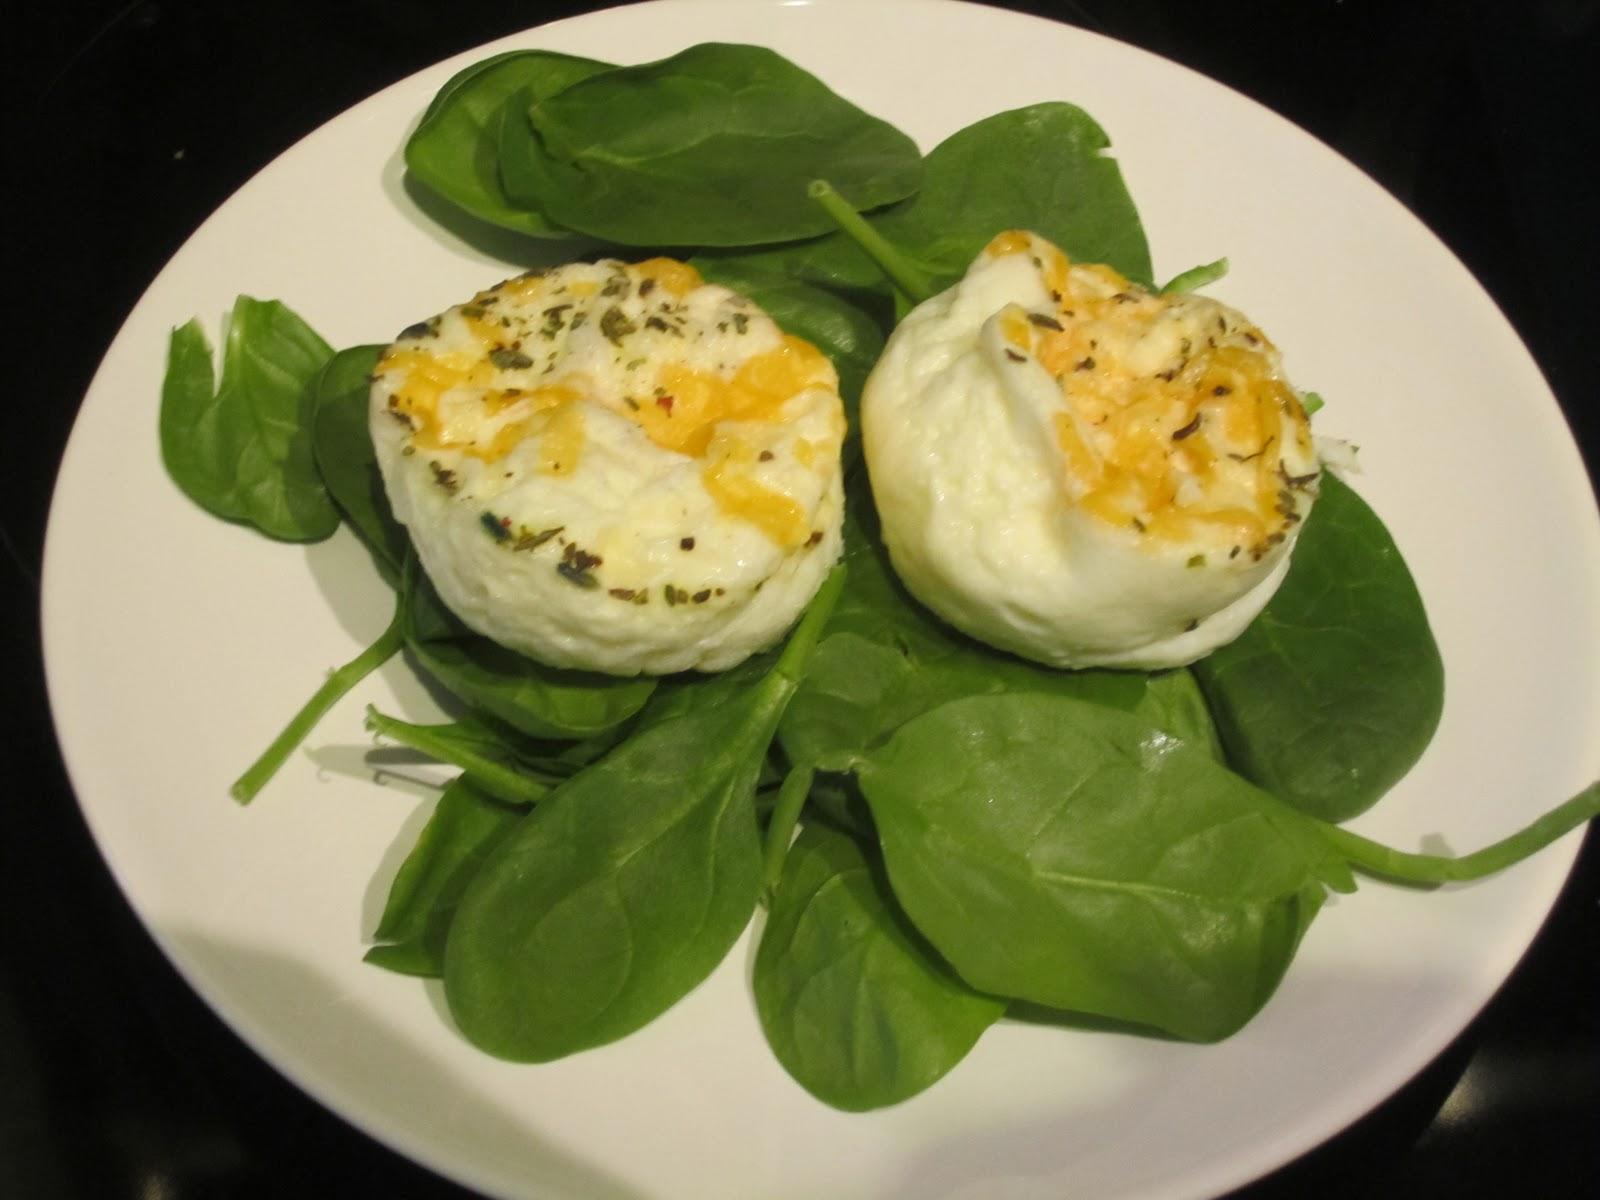 uhealth: Kickstart Breakfast - Cheesy Egg Muffins and Toast.. Delish!